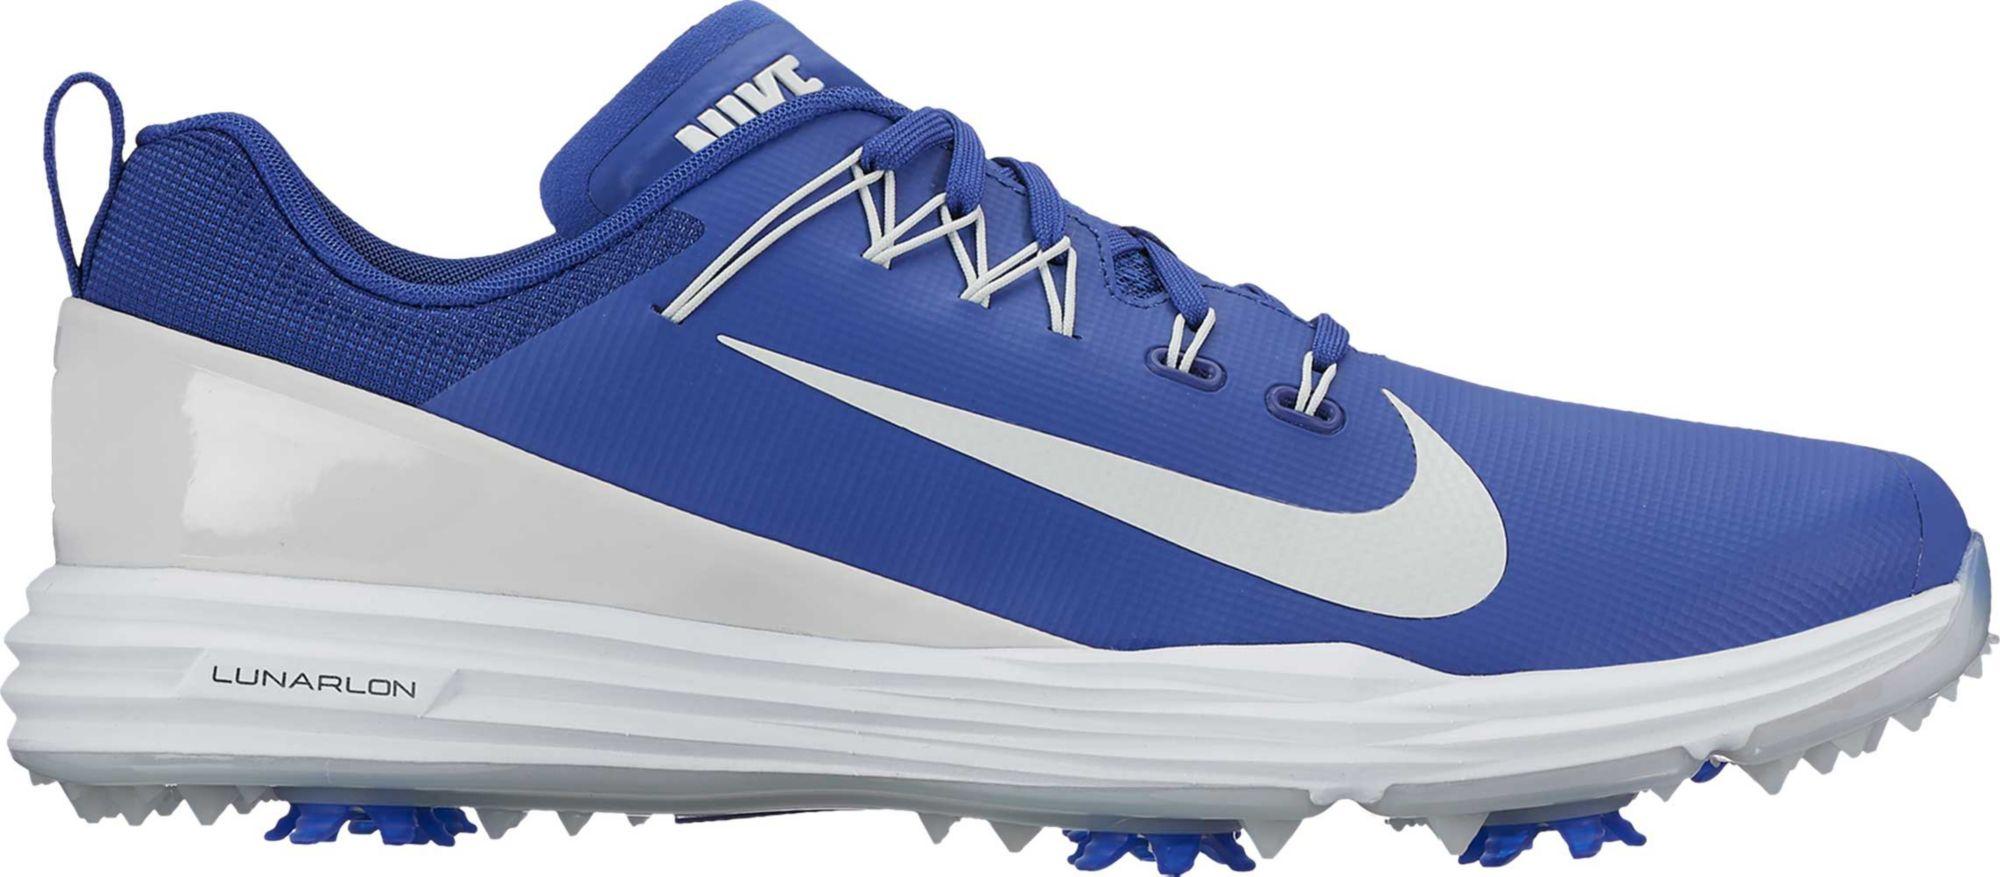 Nike Lunar Command 2 Golf Shoes